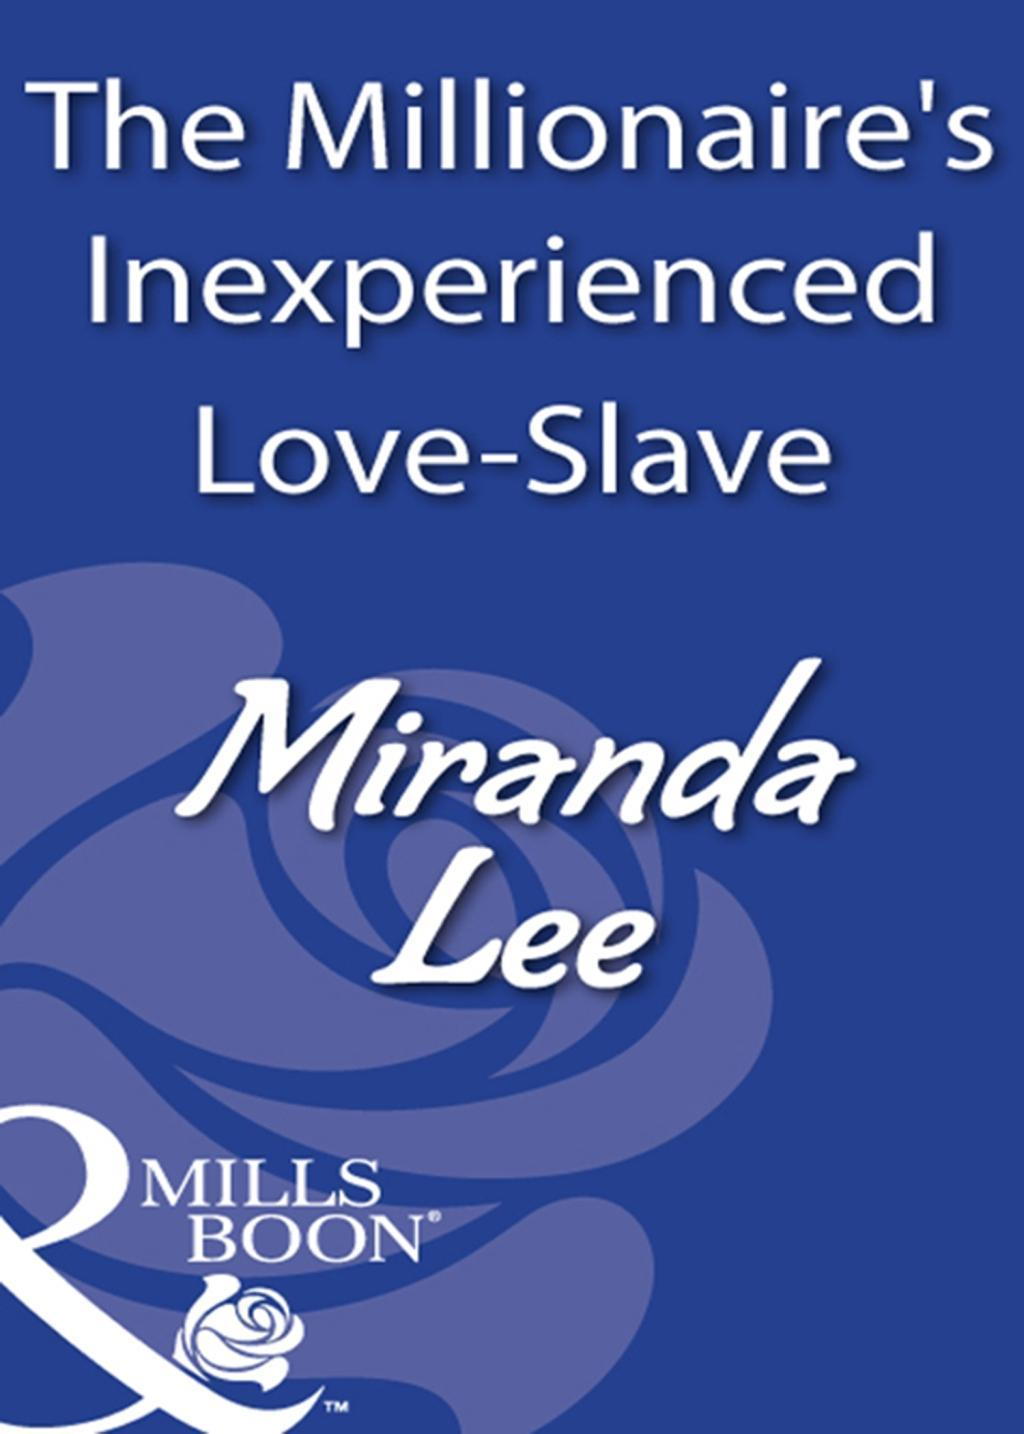 The Millionaire's Inexperienced Love-Slave (Mills & Boon Modern)